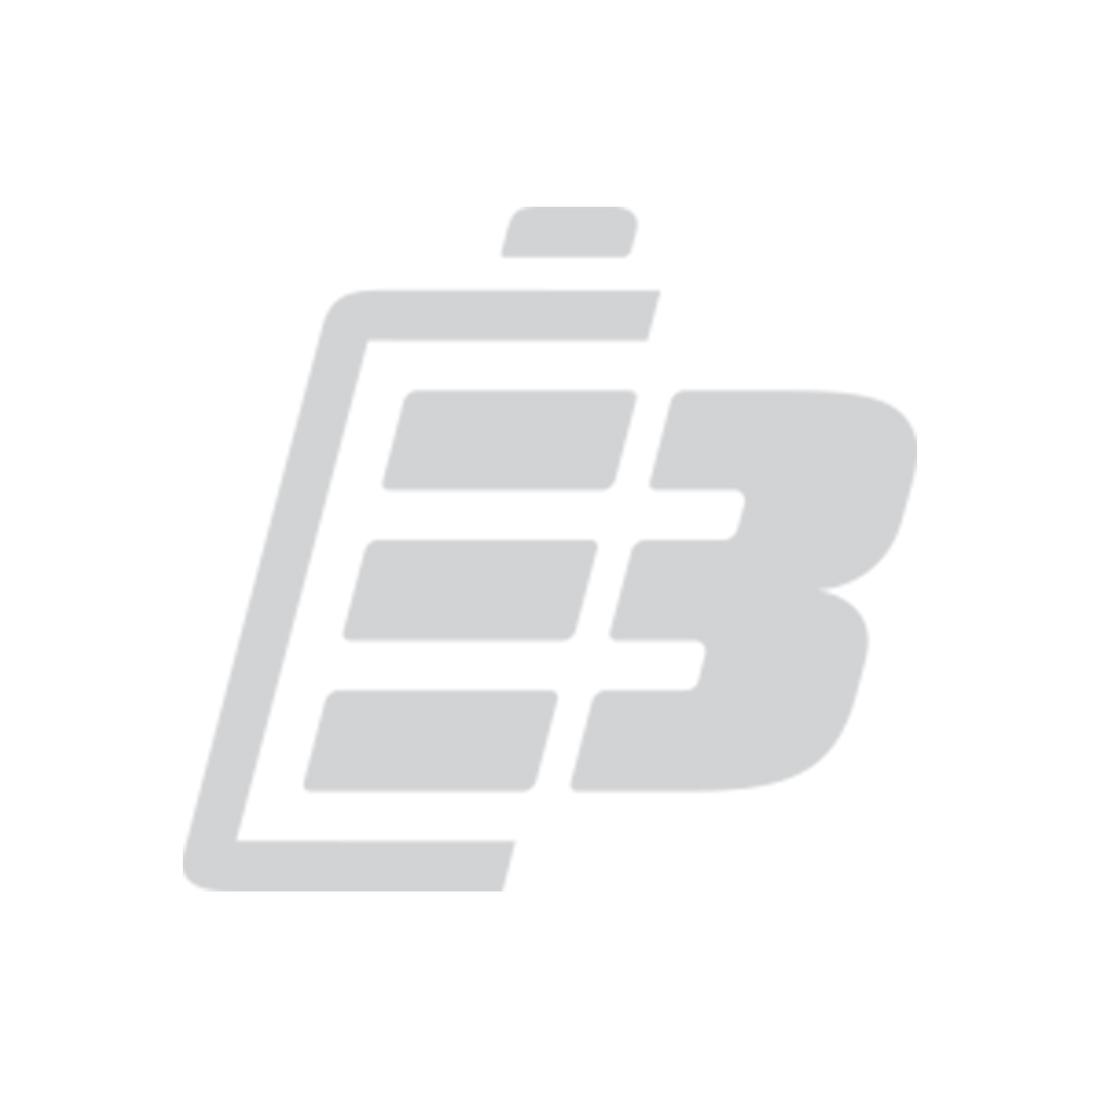 Tablet battery HP Stream 7 5700_1